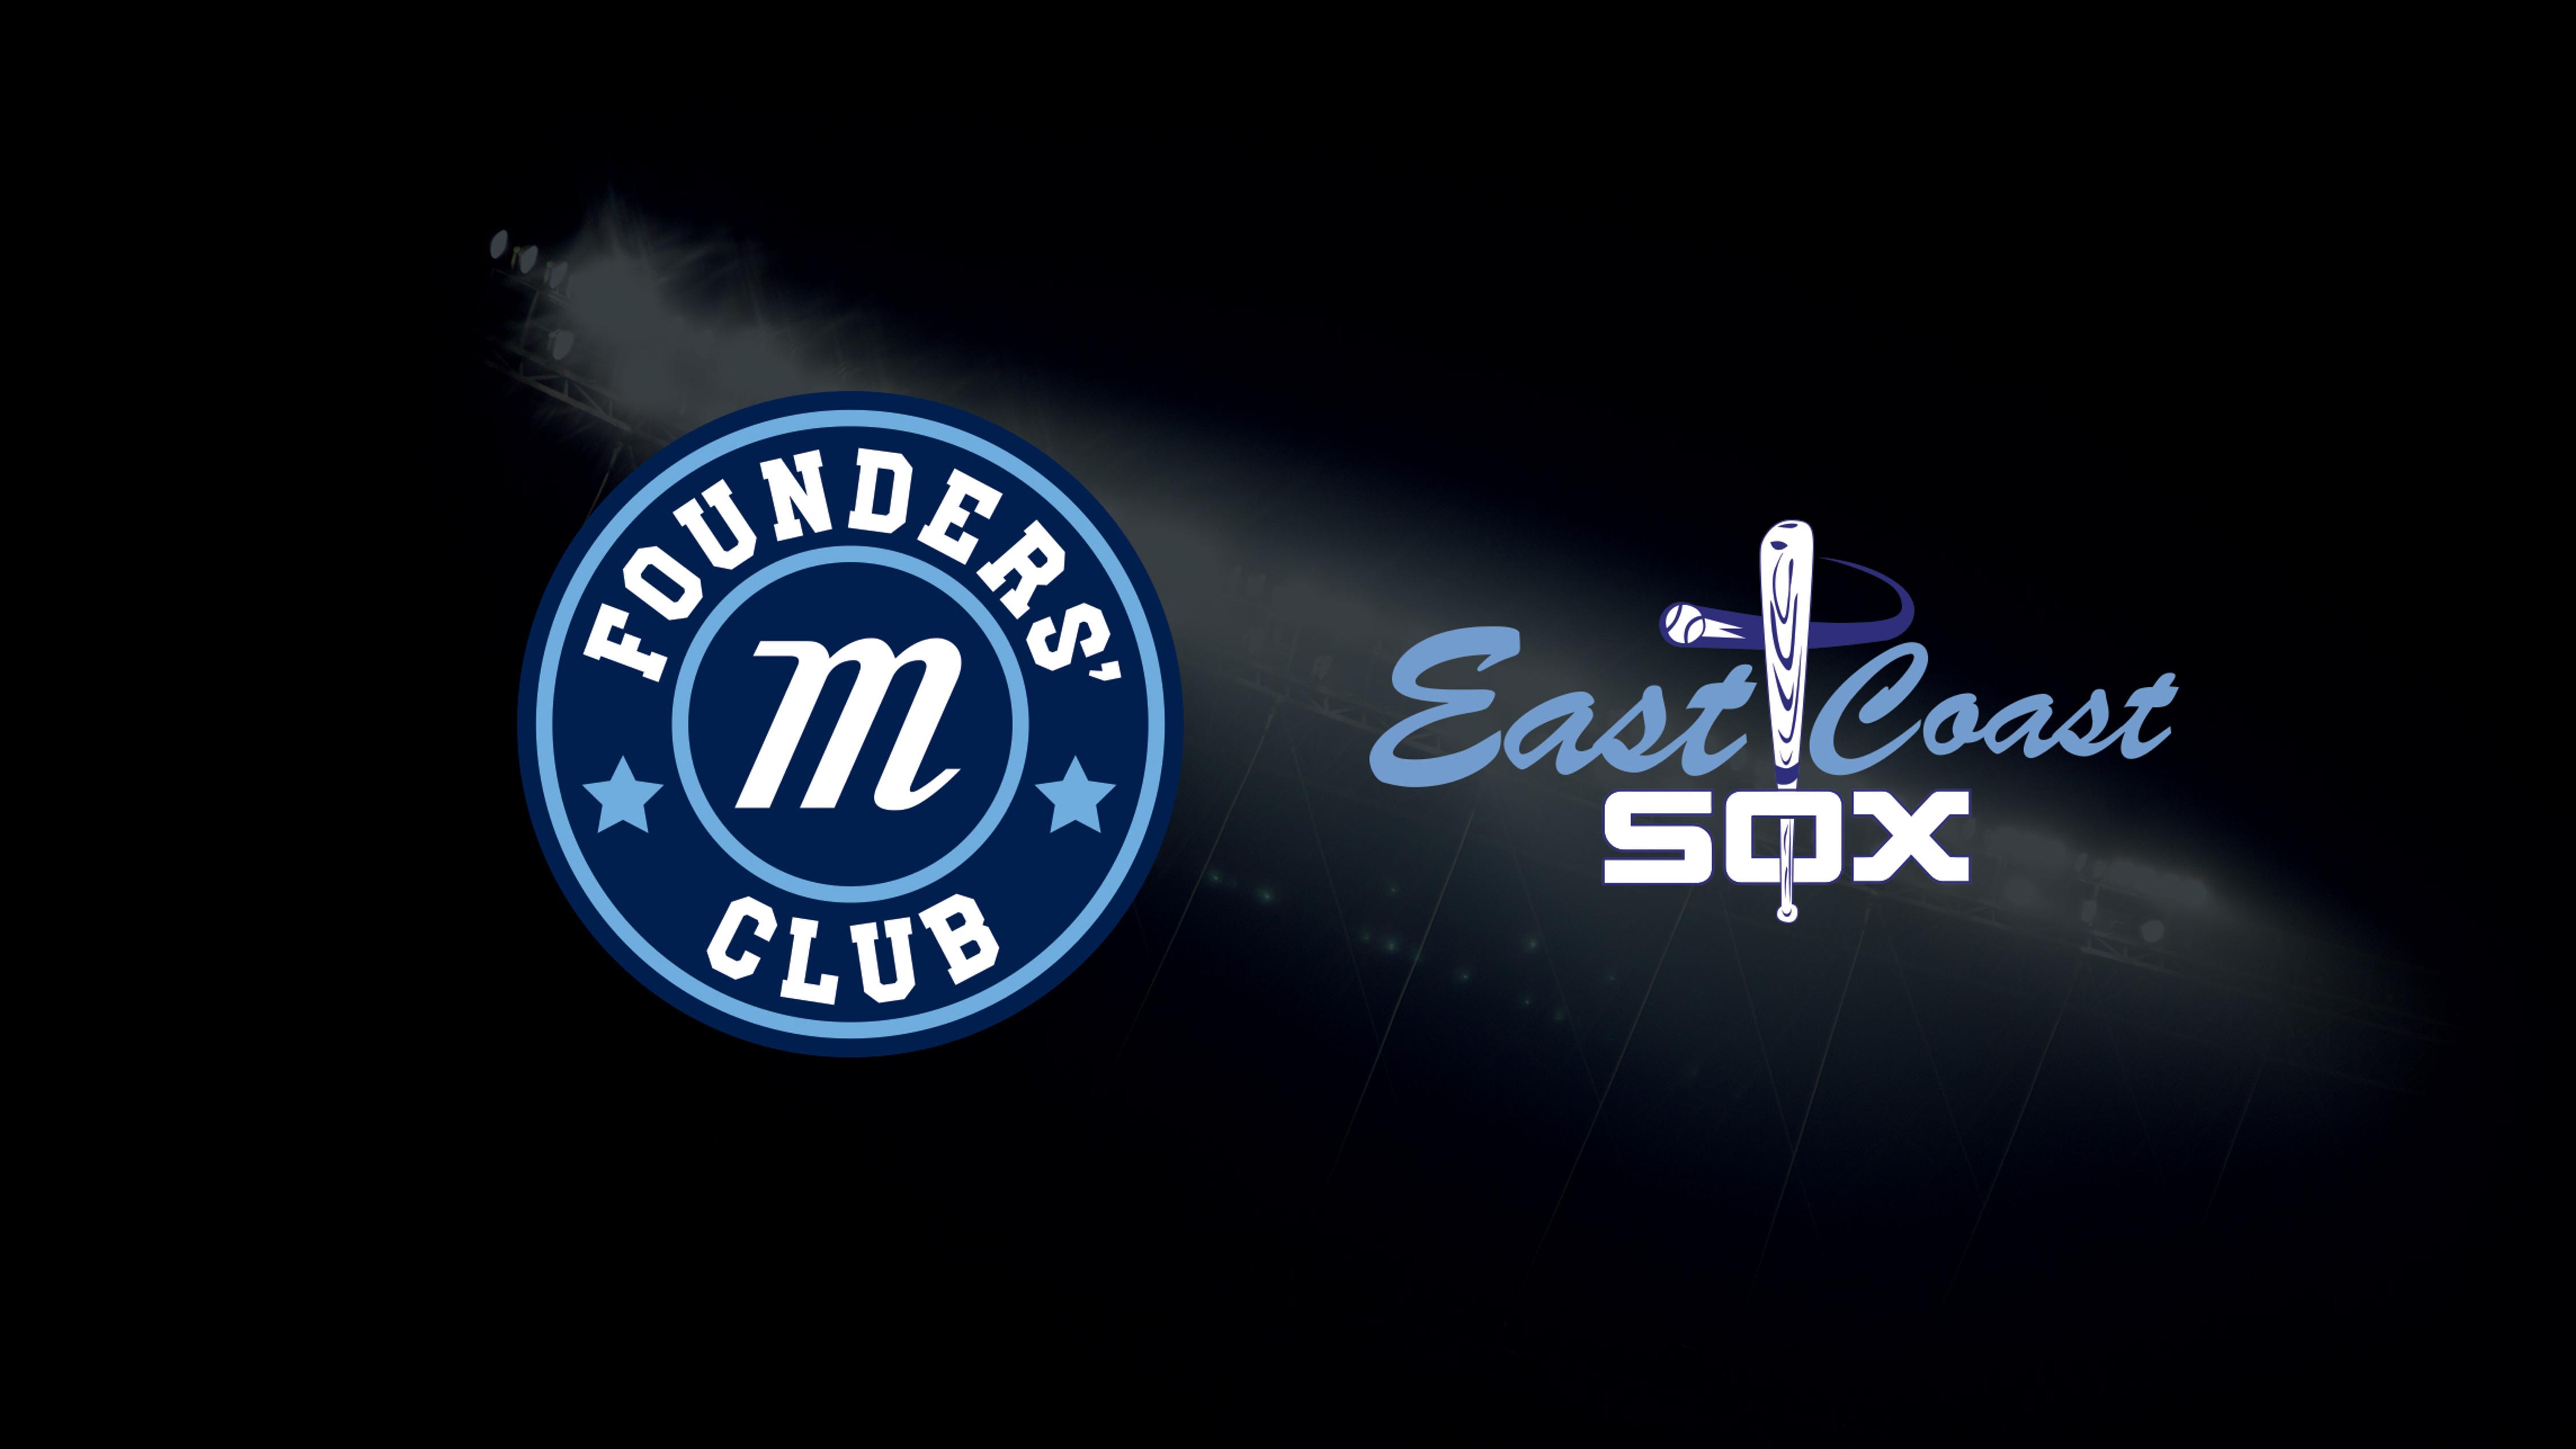 Founders' Club Spotlight: East Coast Sox